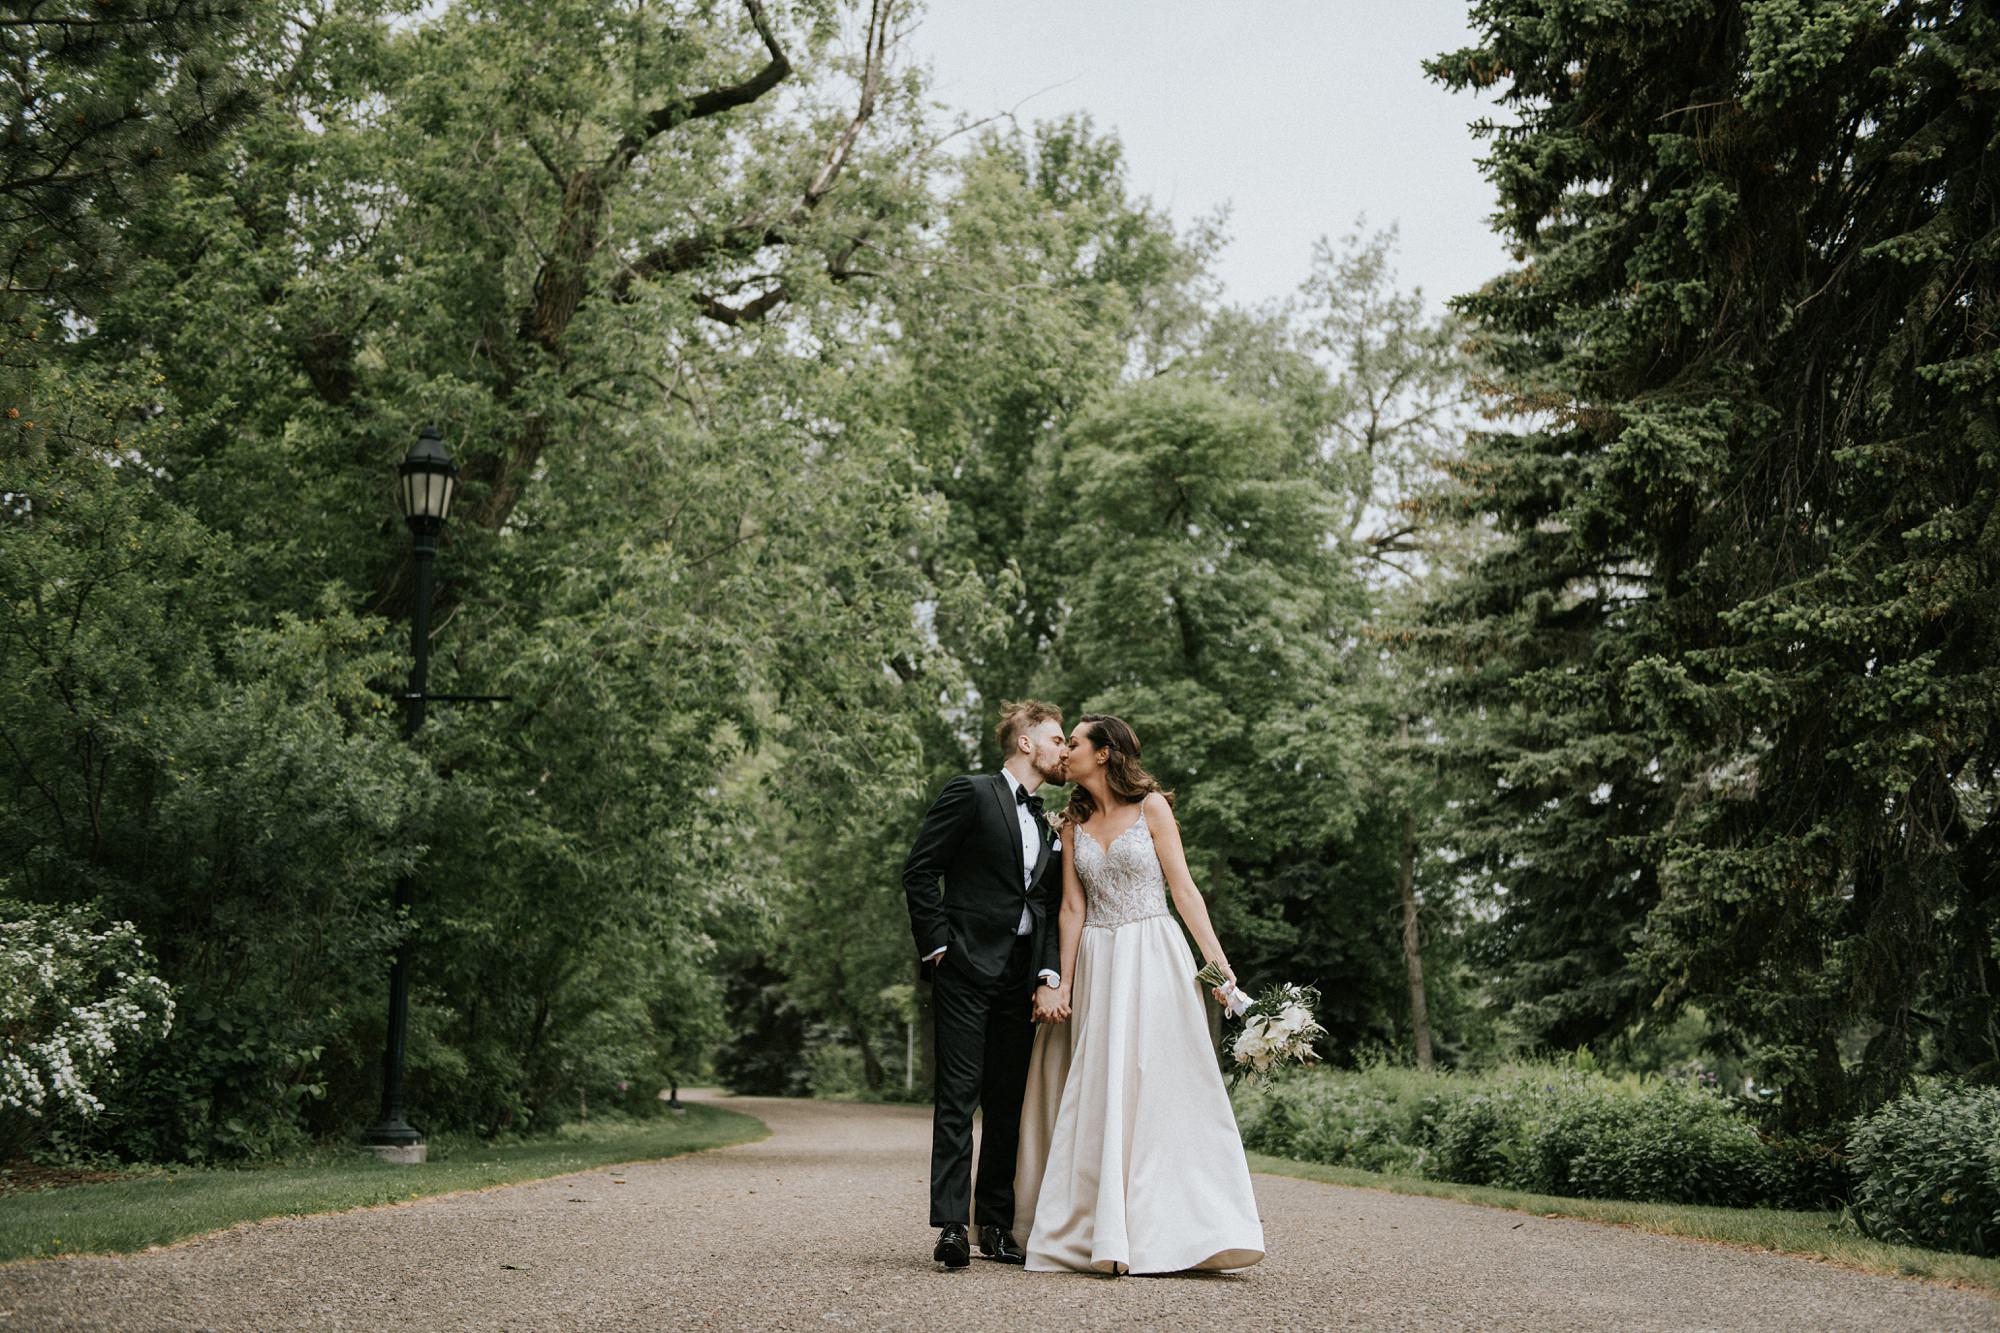 bride and groom walking in riley park in downtown calgary wedding